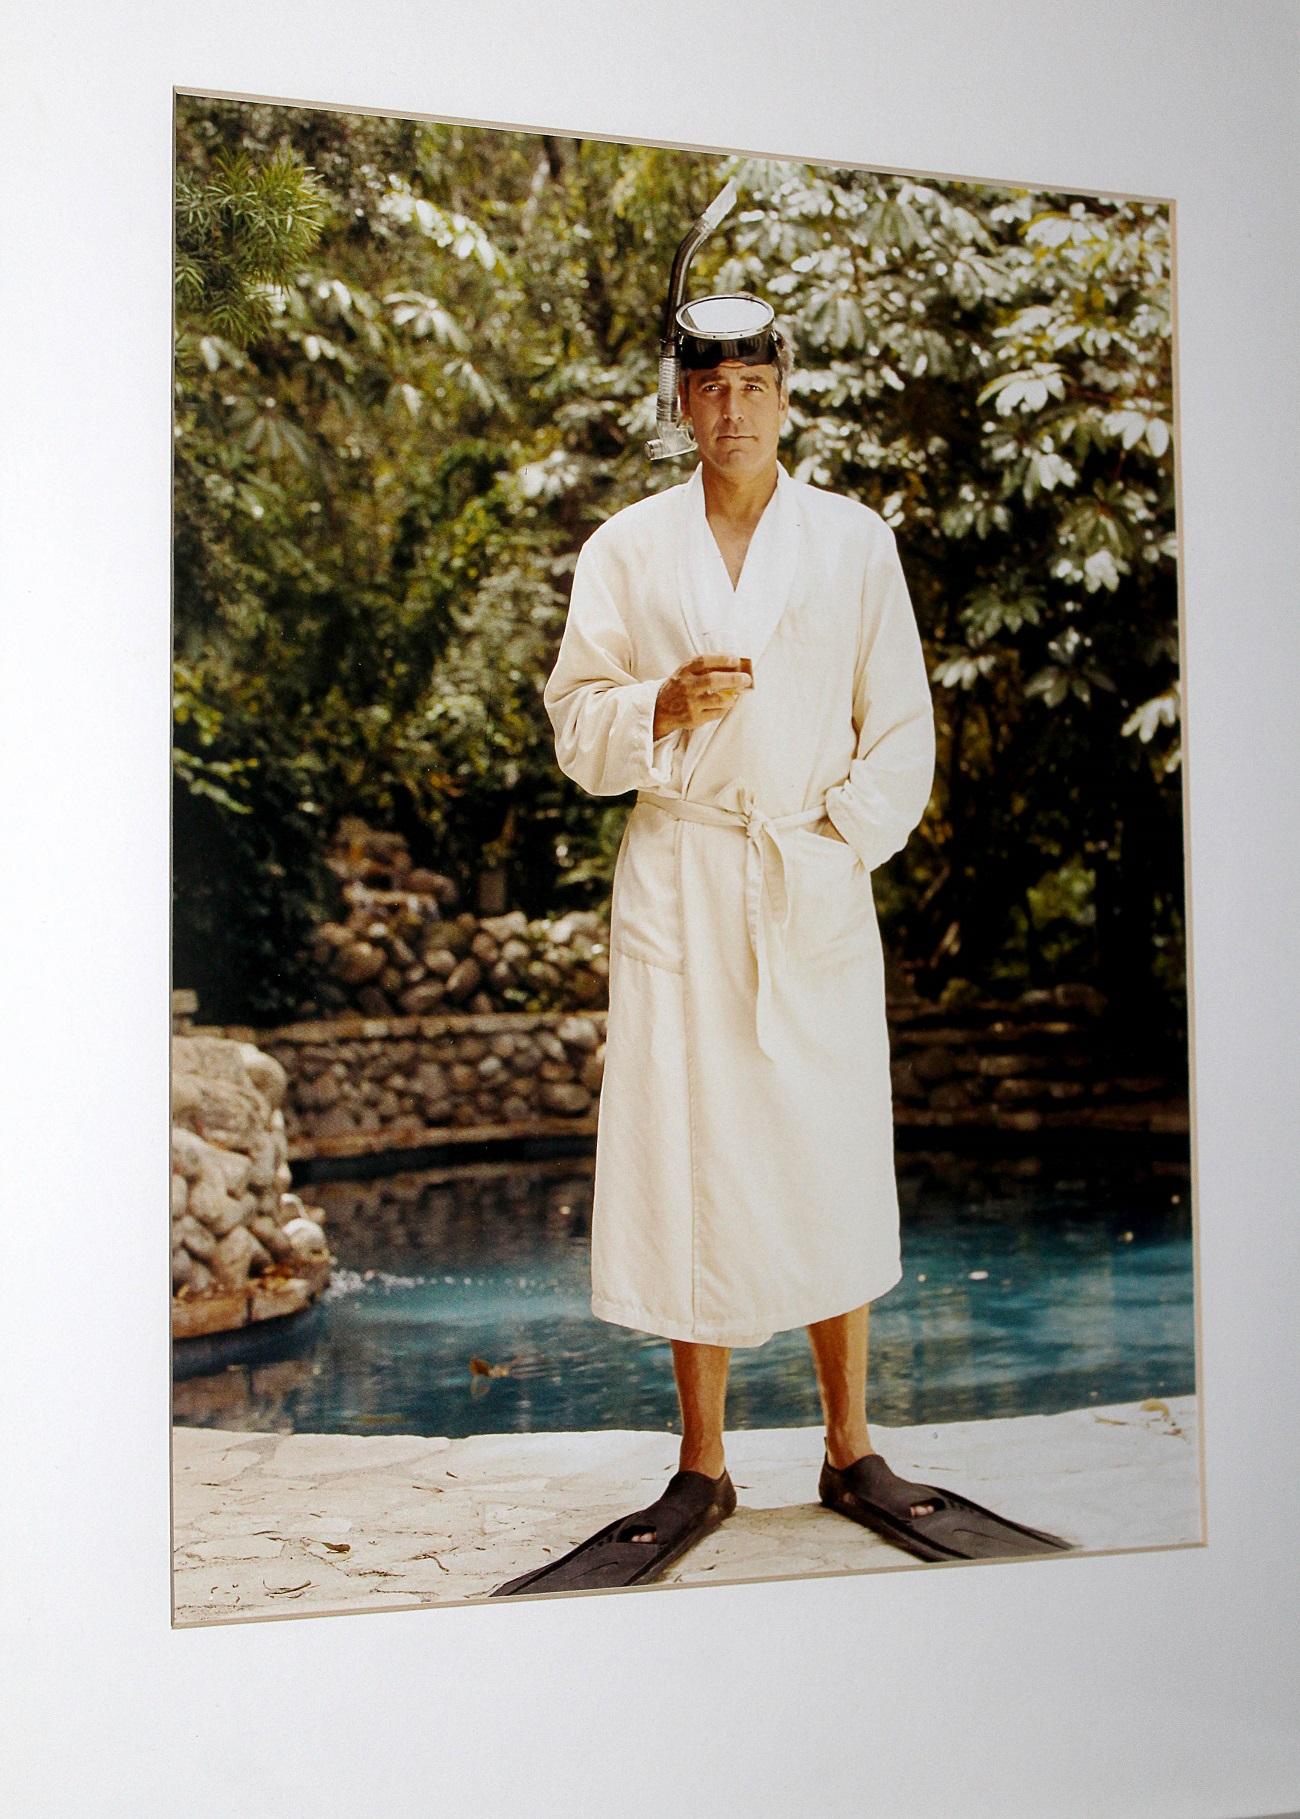 MonHotel_Lounge_and_Spa_Paris_Gorge_Clooney.jpg